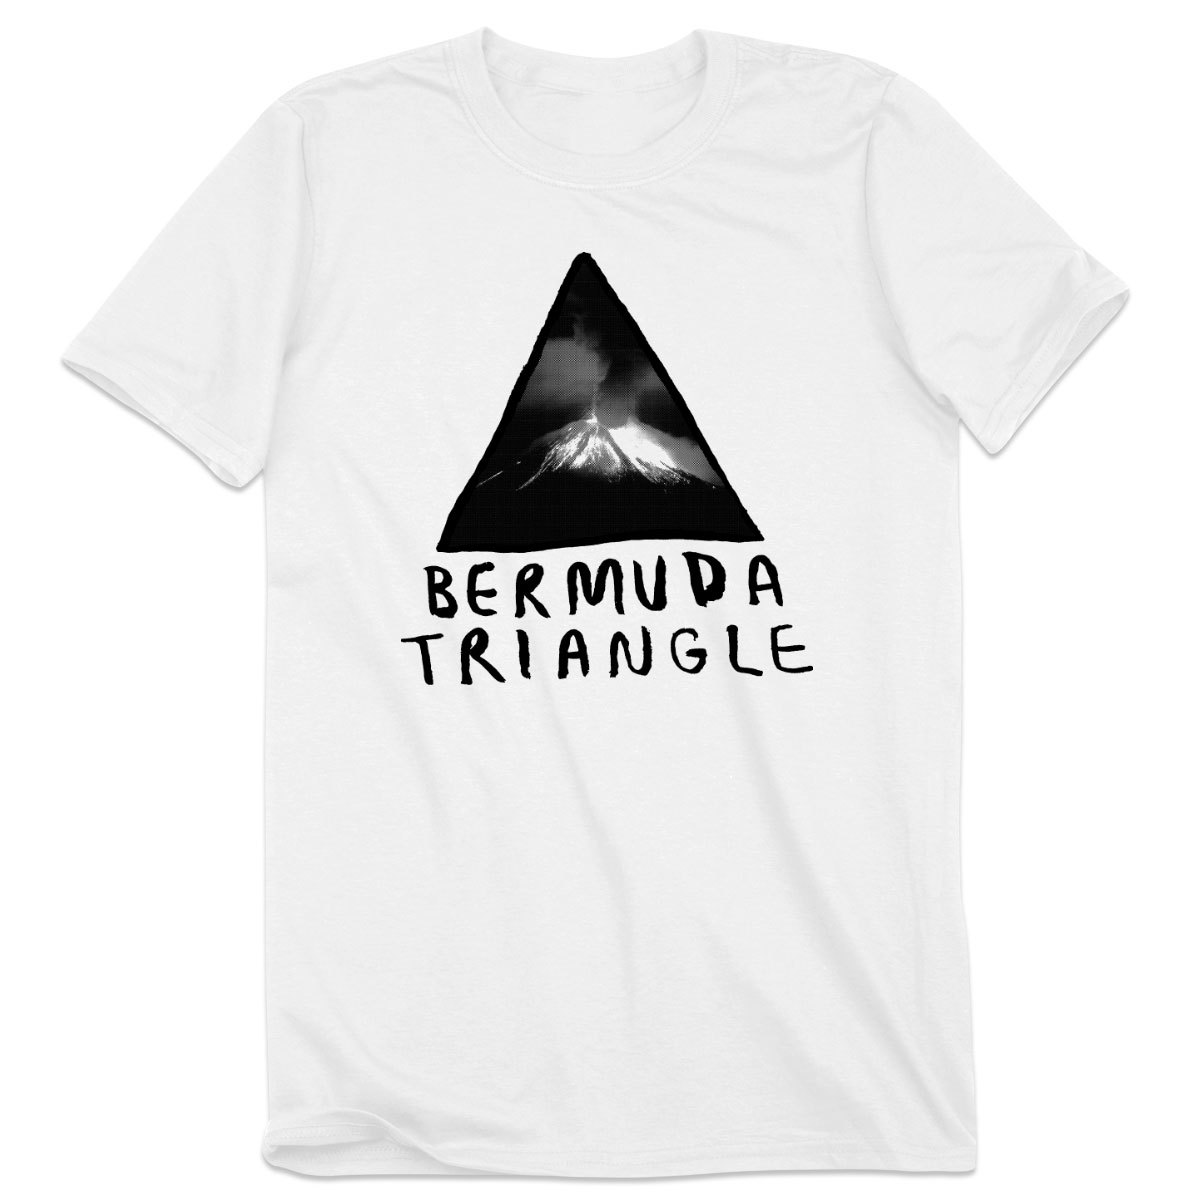 Bermuda Triangle Volcano Logo Tee